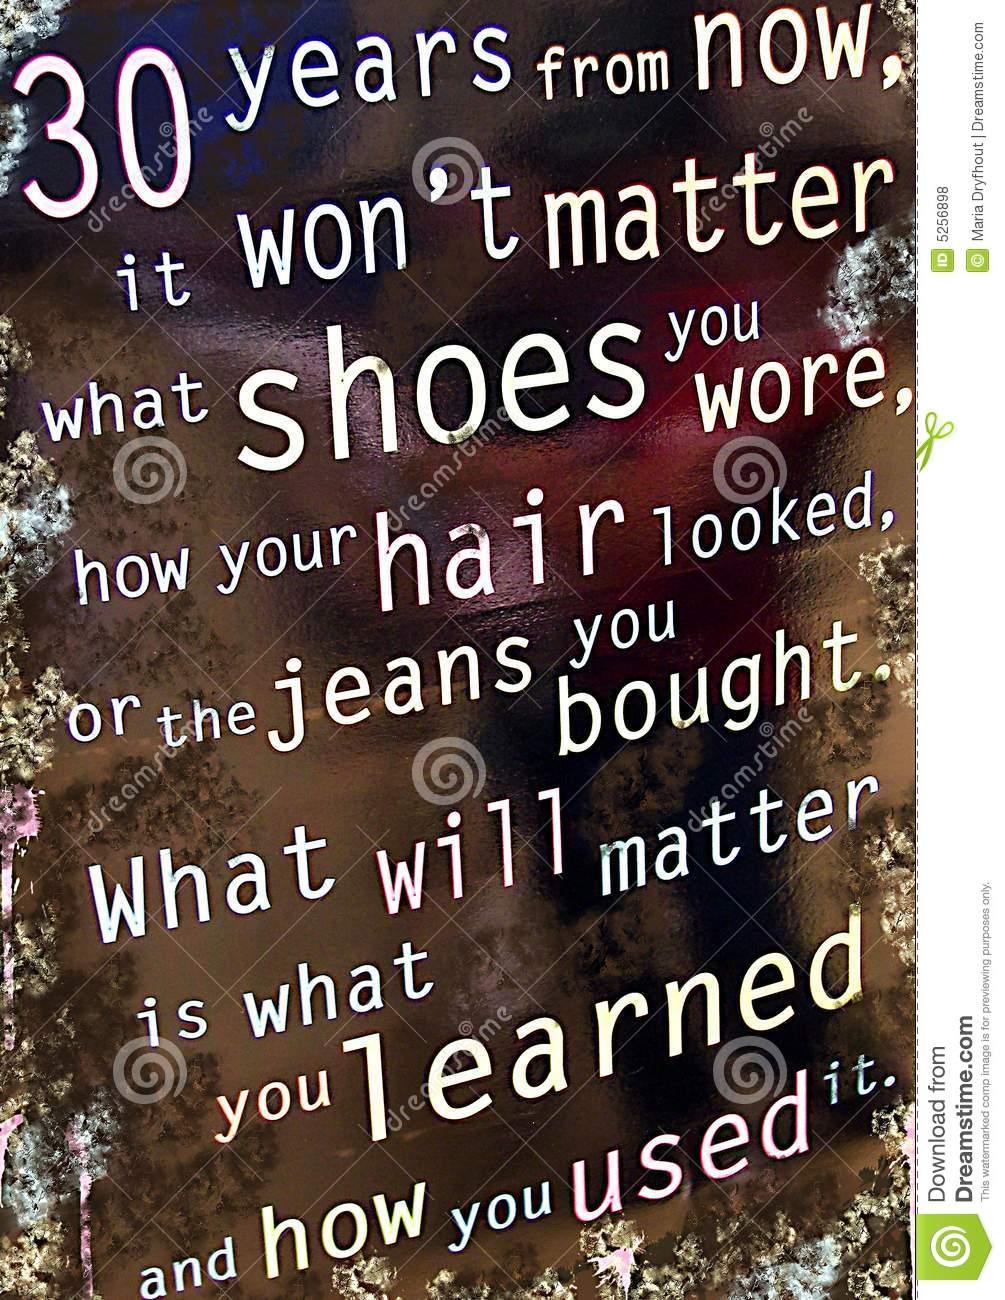 Copyright Free Inspirational Quotes Quotesgram